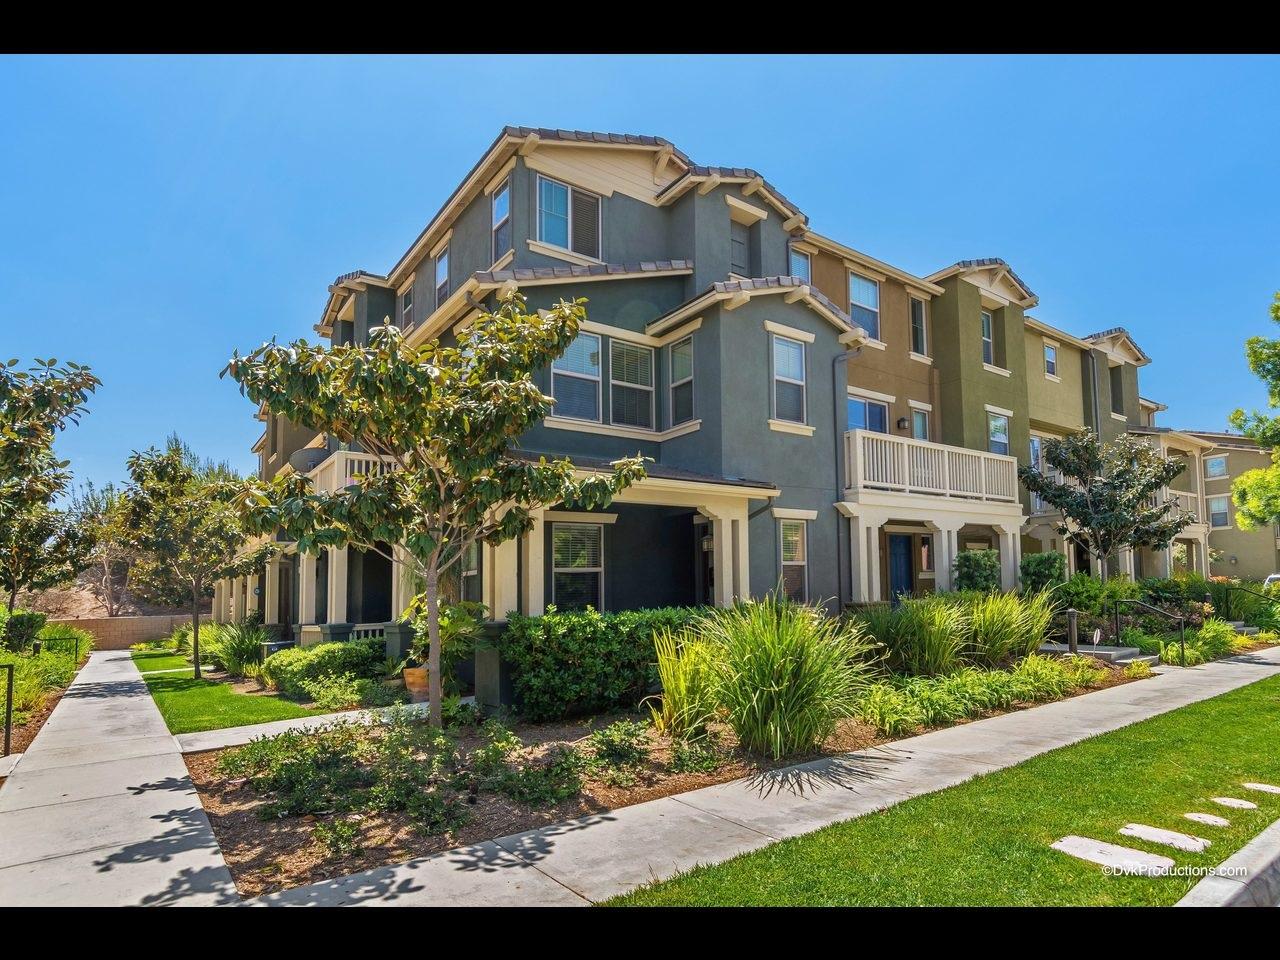 1811 Lime Ct #APT 6, Chula Vista, CA